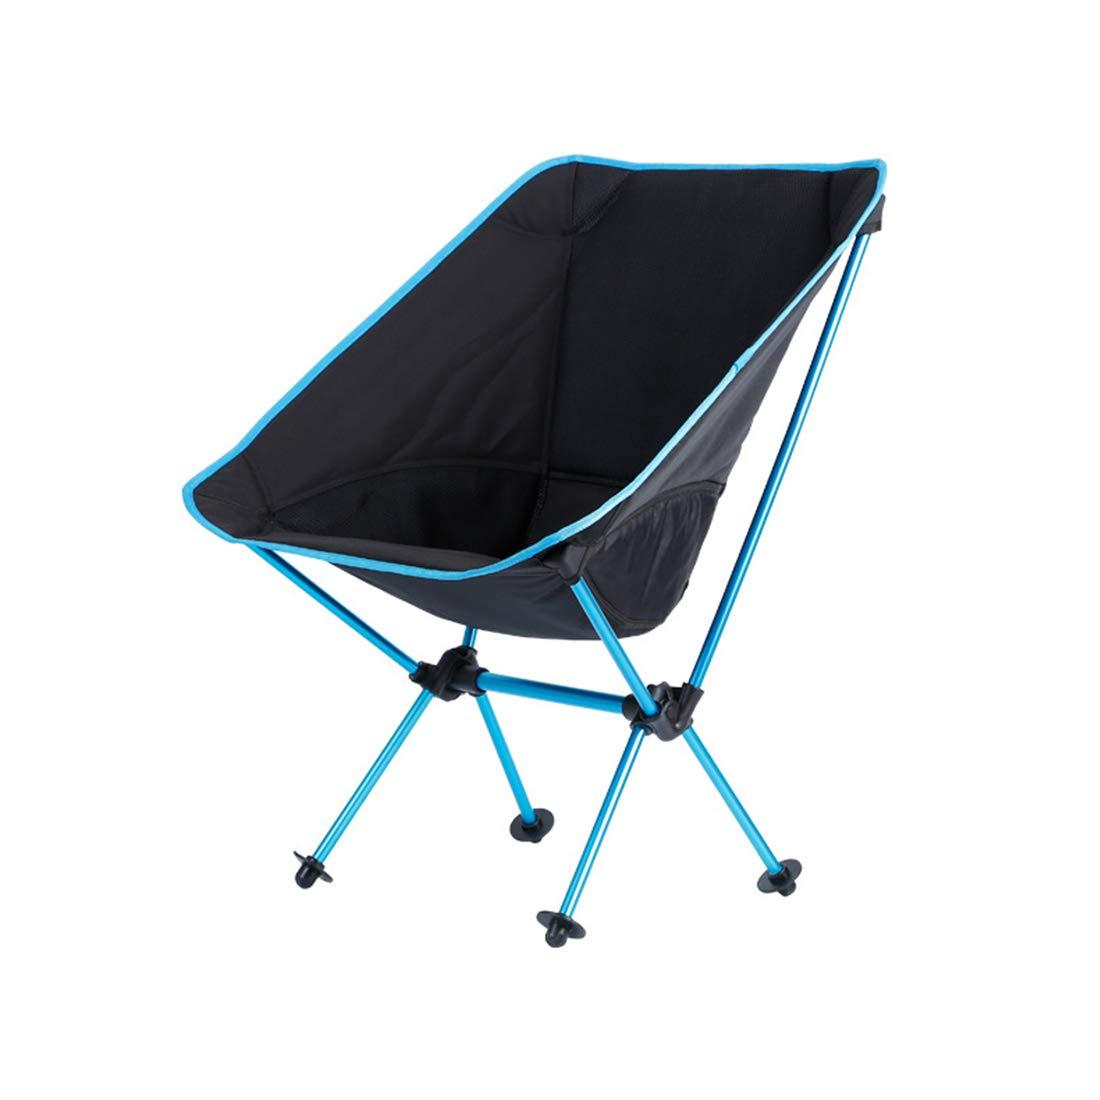 FUBULECY Outdoor Stuhl Kompakte Stuhl Montiert kompakte leichte Mobile Bequeme Faltbare Art Mobile Stuhl Mobile Bequeme Camping Barbecue Angeln Portable